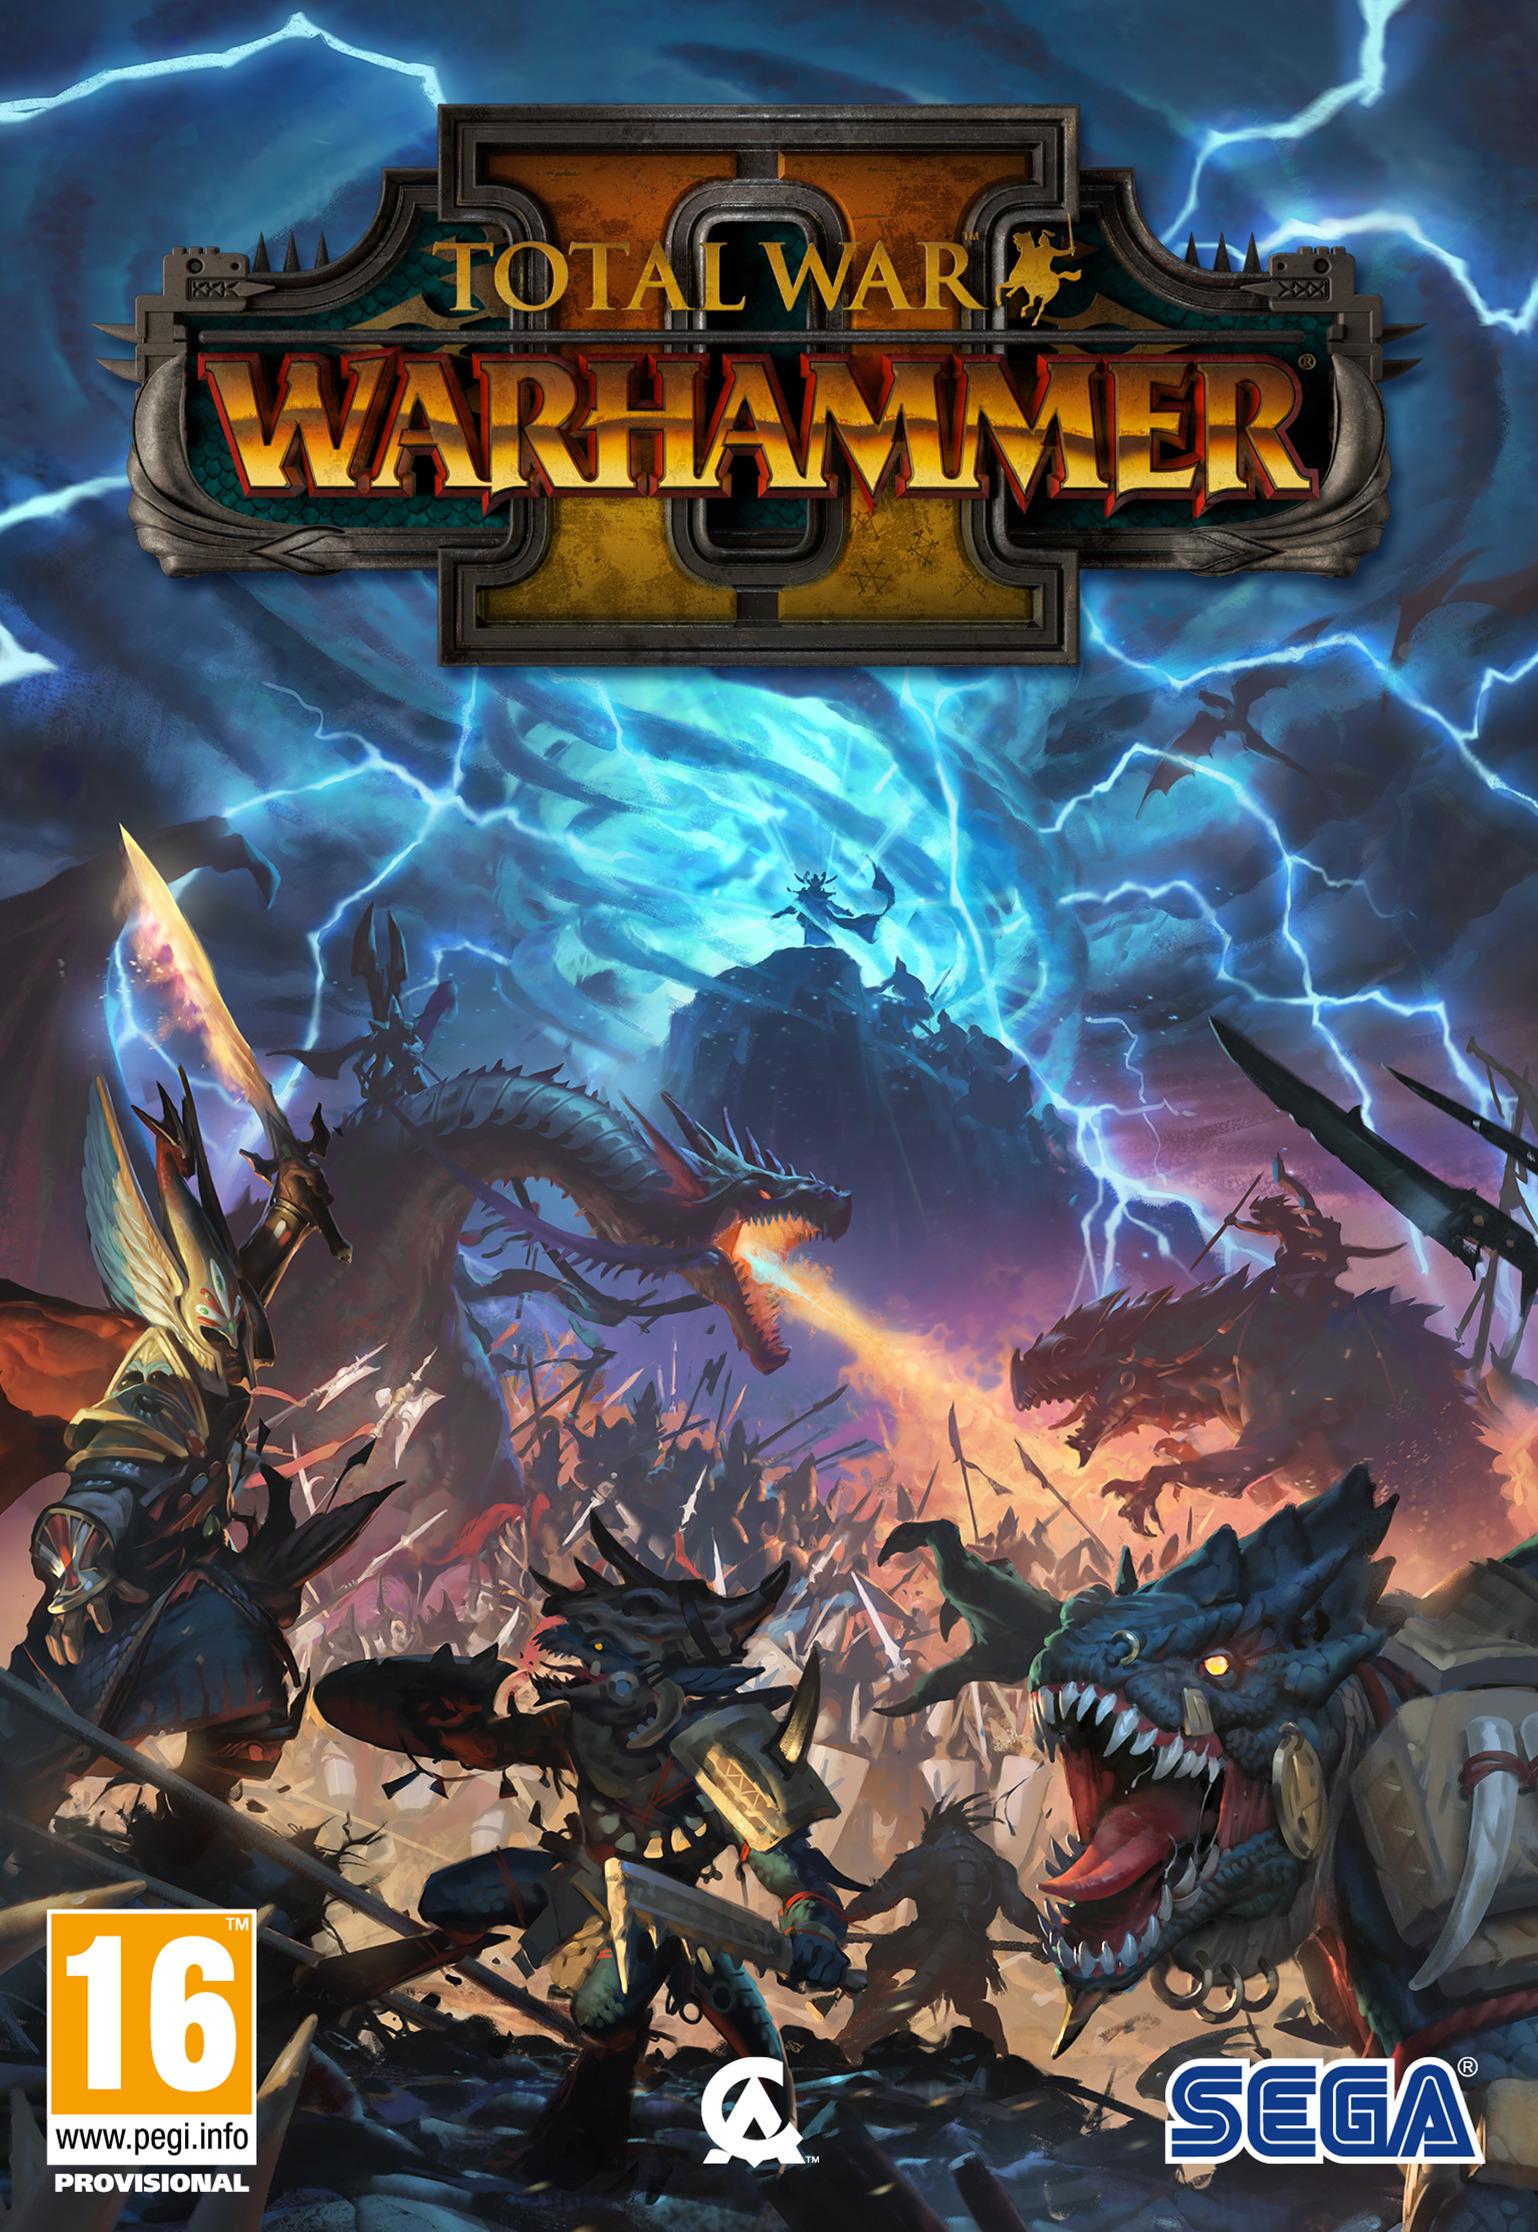 Total War: WARHAMMER 2 v.1.4.1 + 22 DLC (2017) RePack